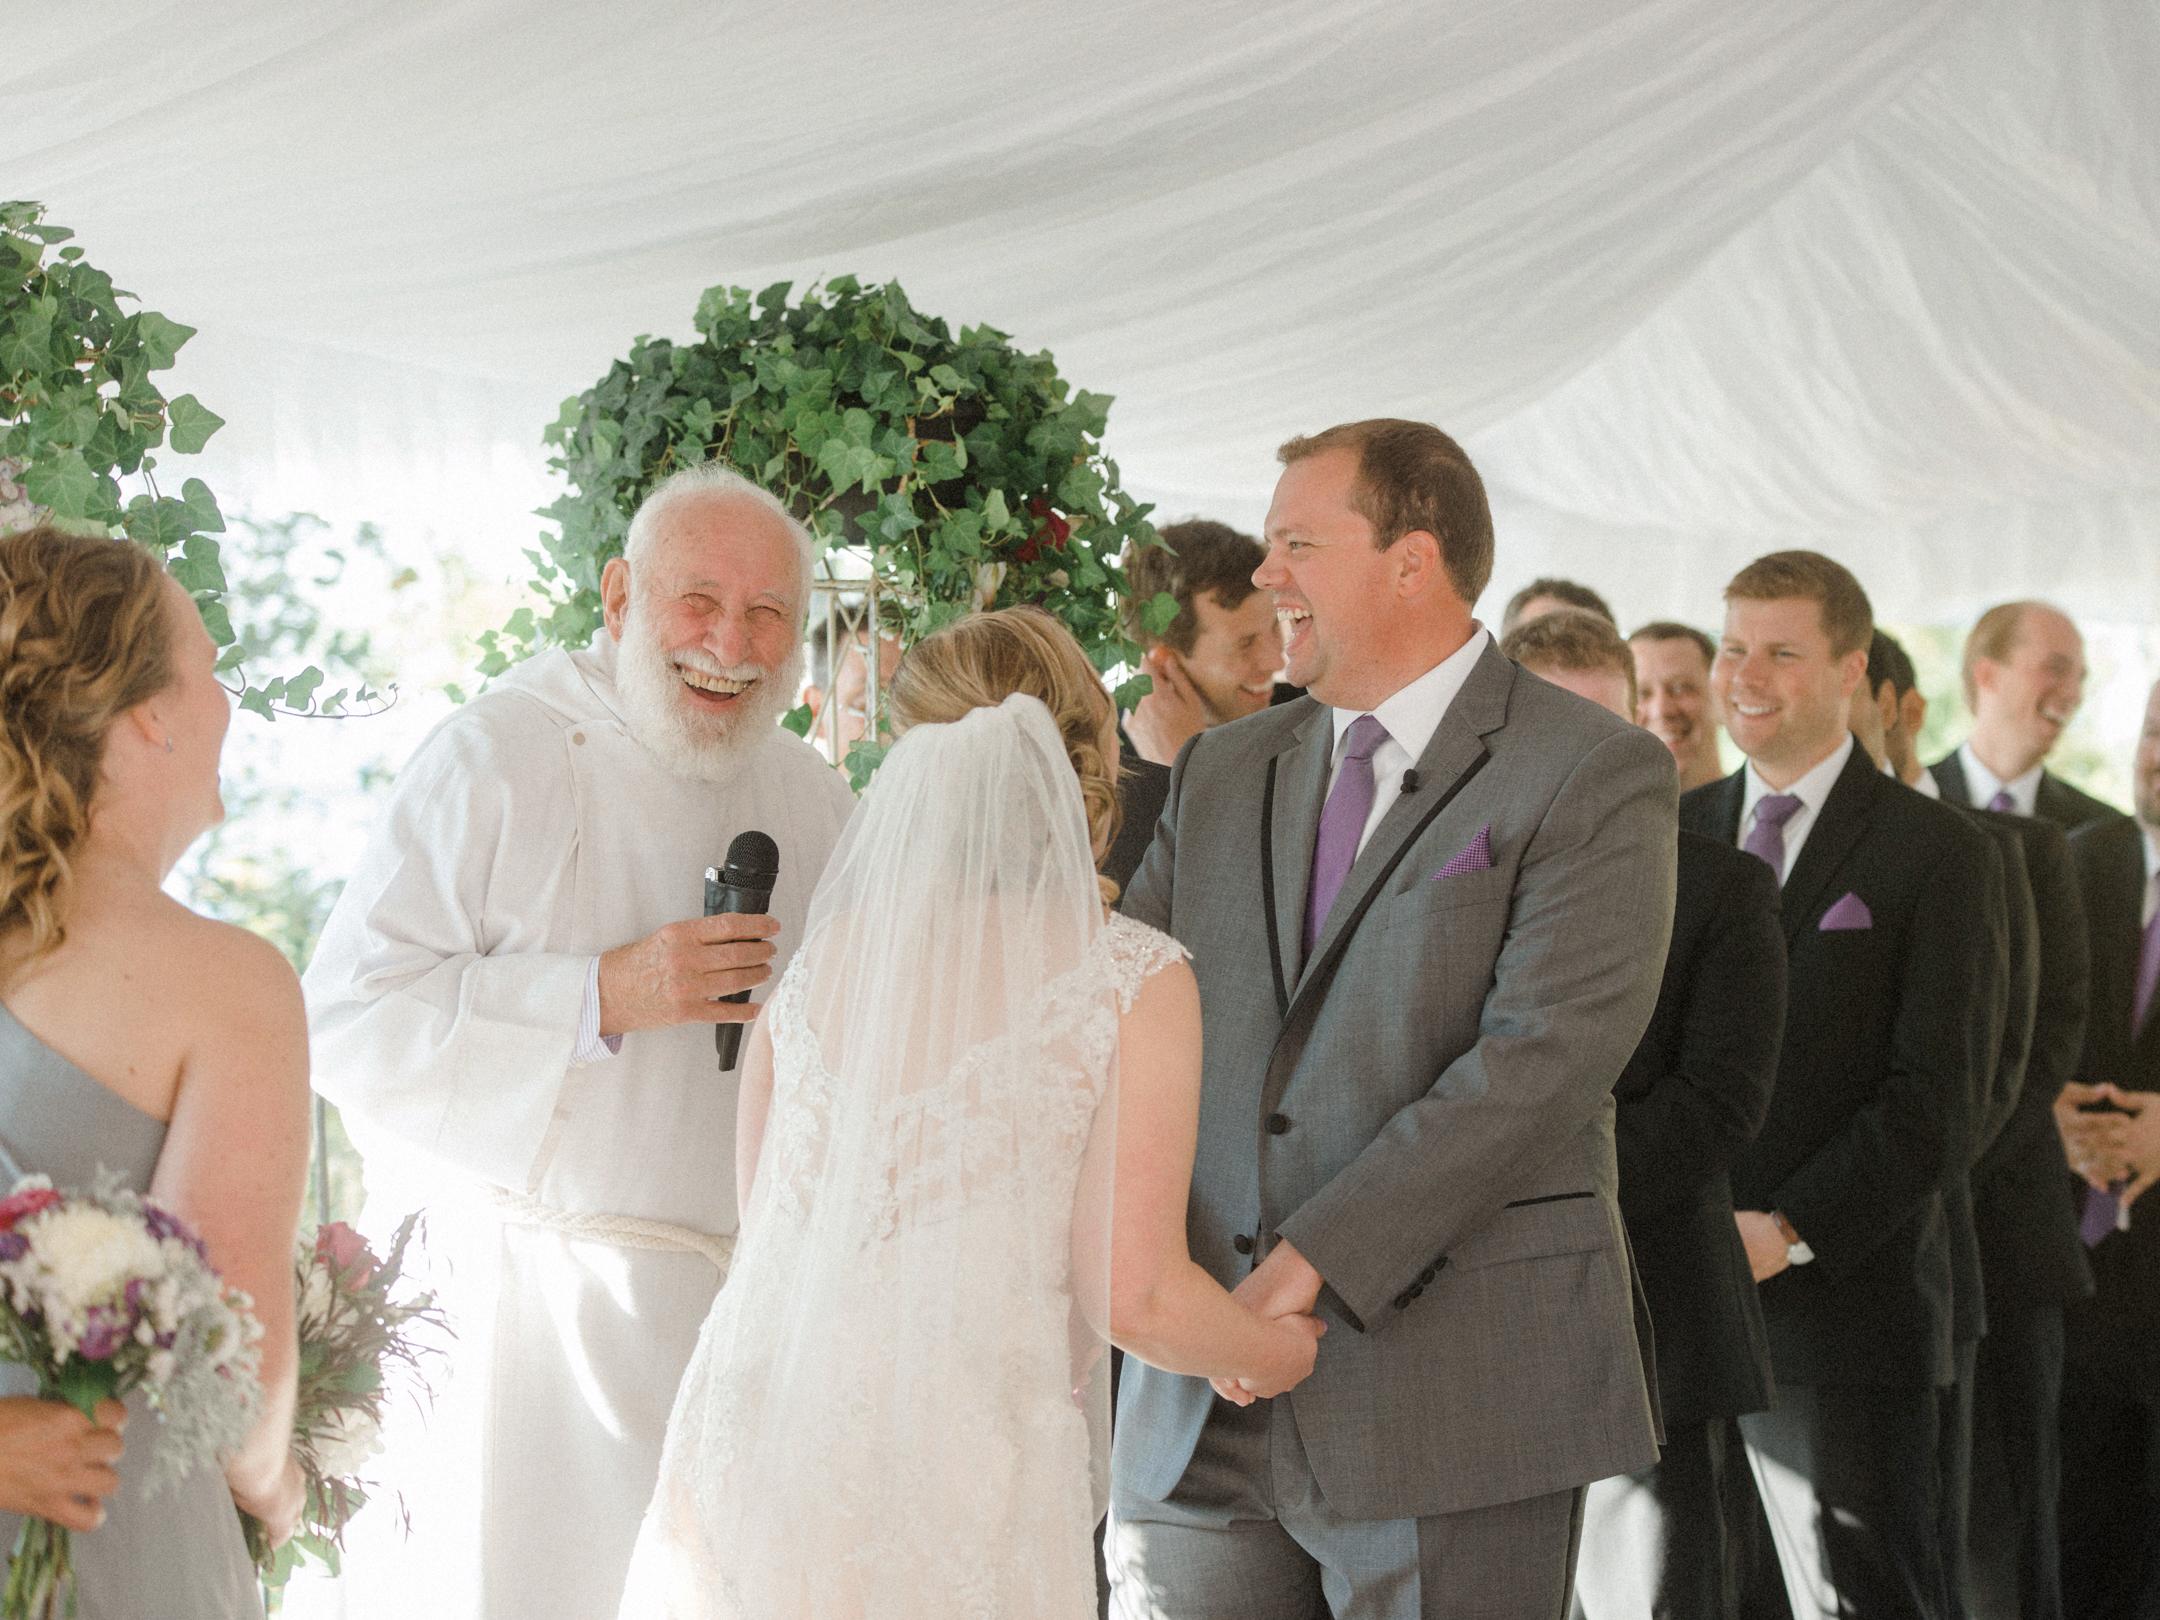 21-Horseshoe-Bay-Golf-Club-Door-County-Wedding.jpg